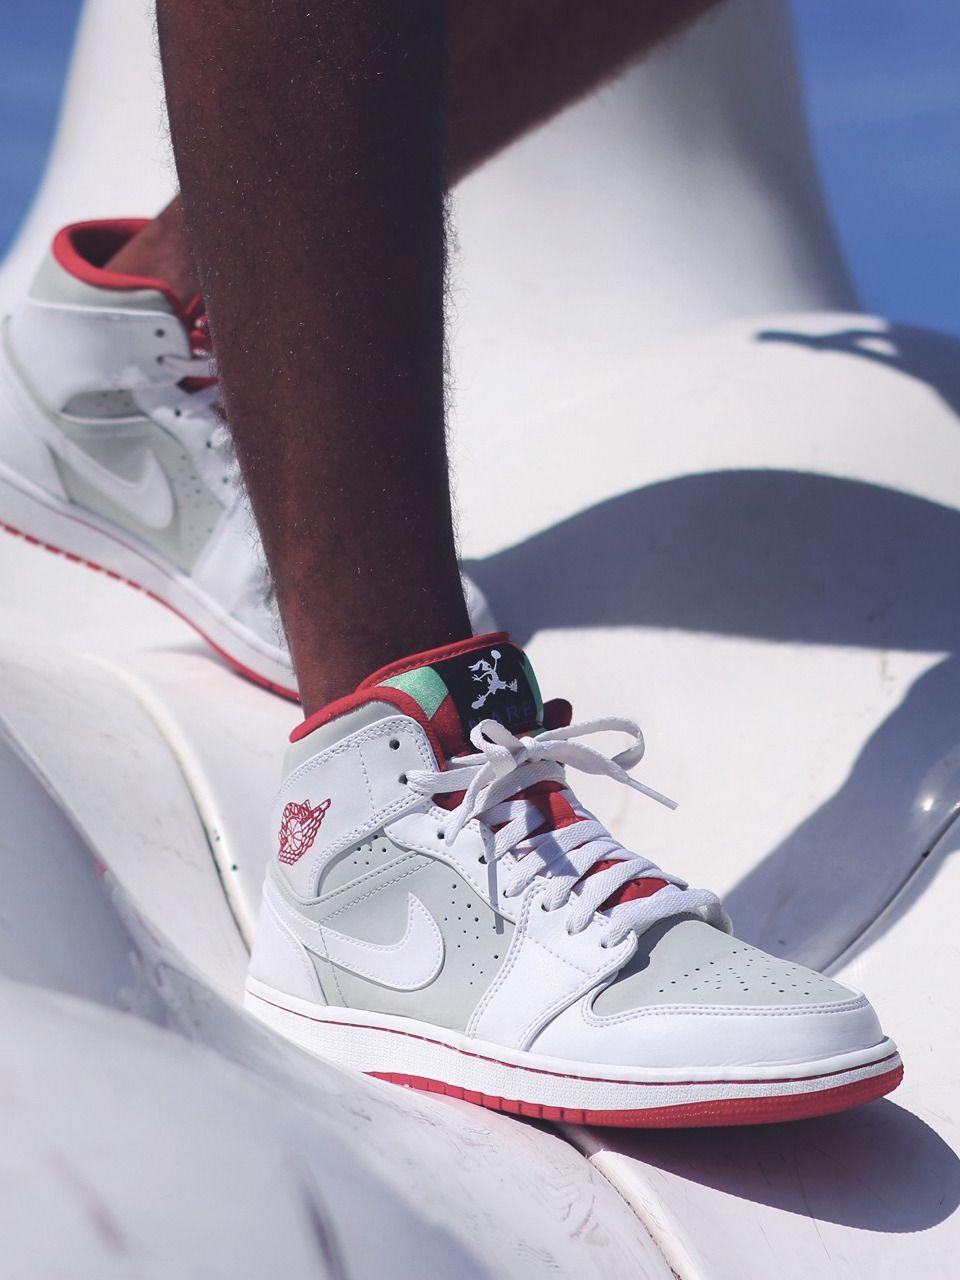 7eeac646891 Adidas Dikembe Mutombo par Snipes (26.08.2013)